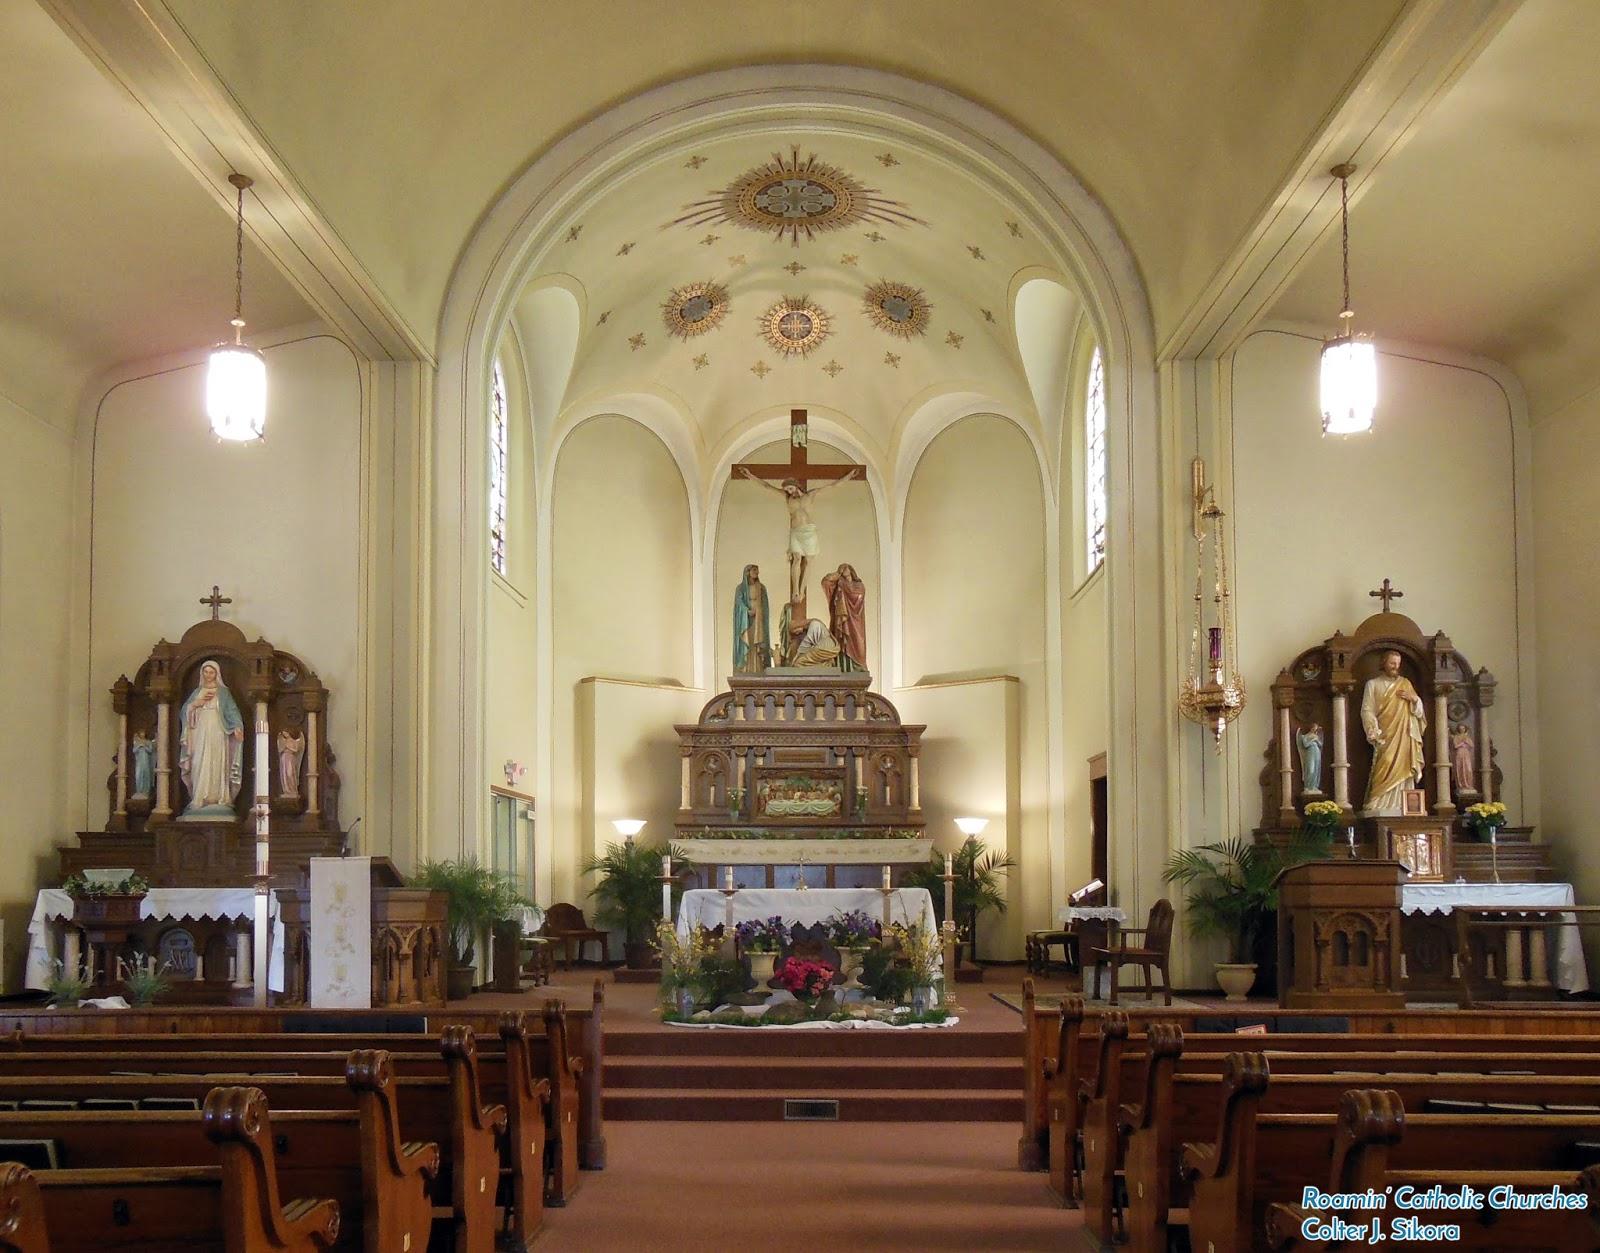 Roamin Catholic Churches September